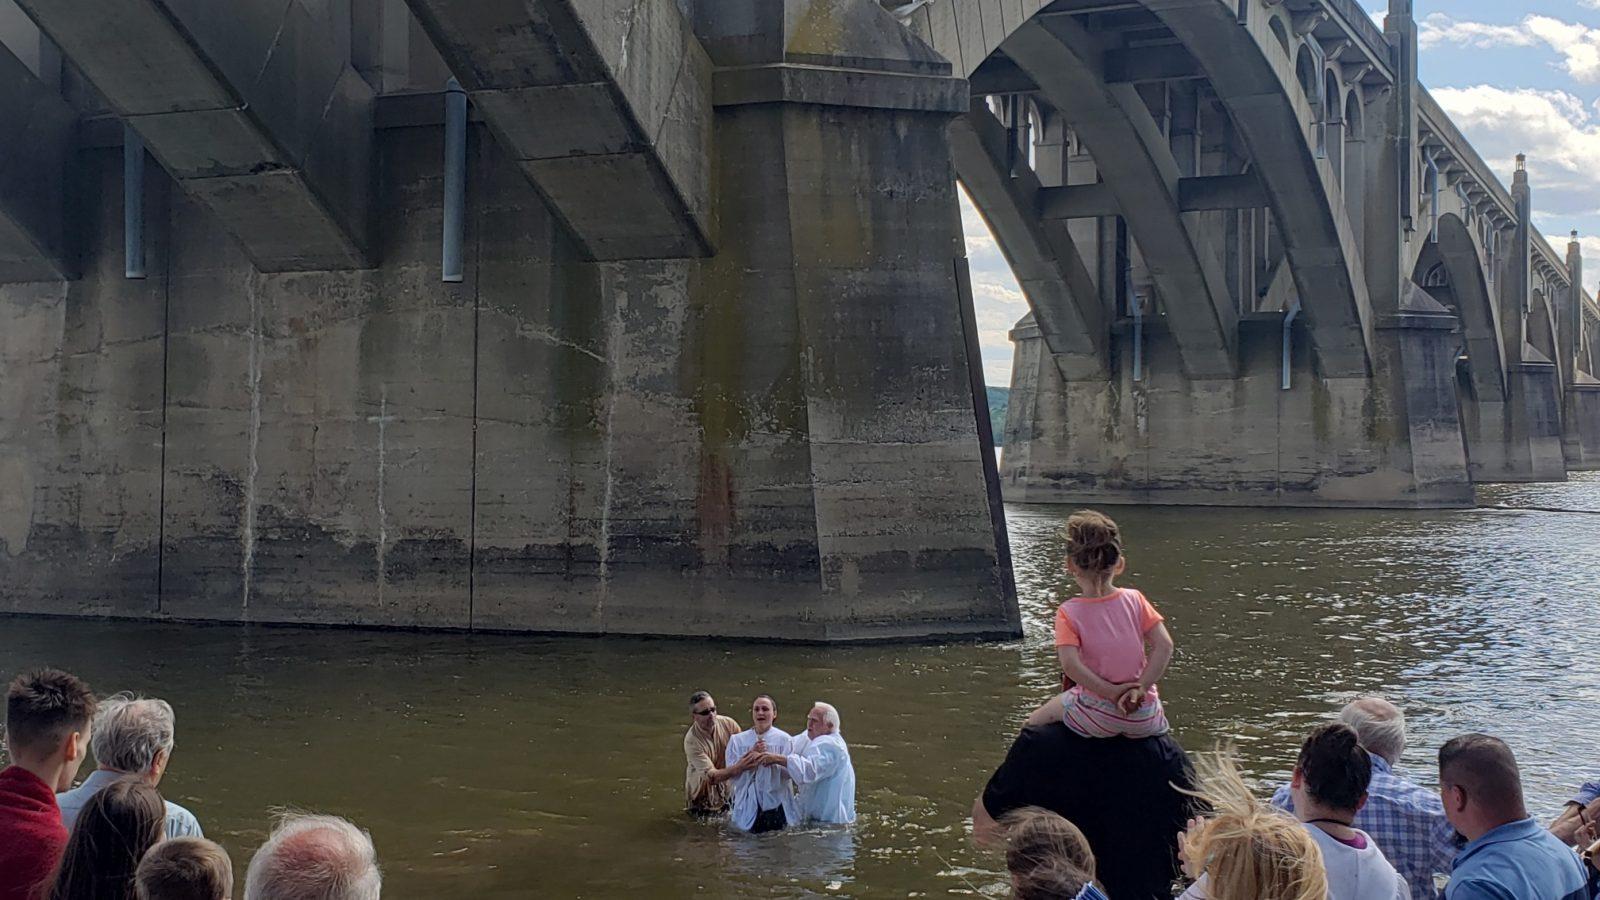 baptism on Pentecost